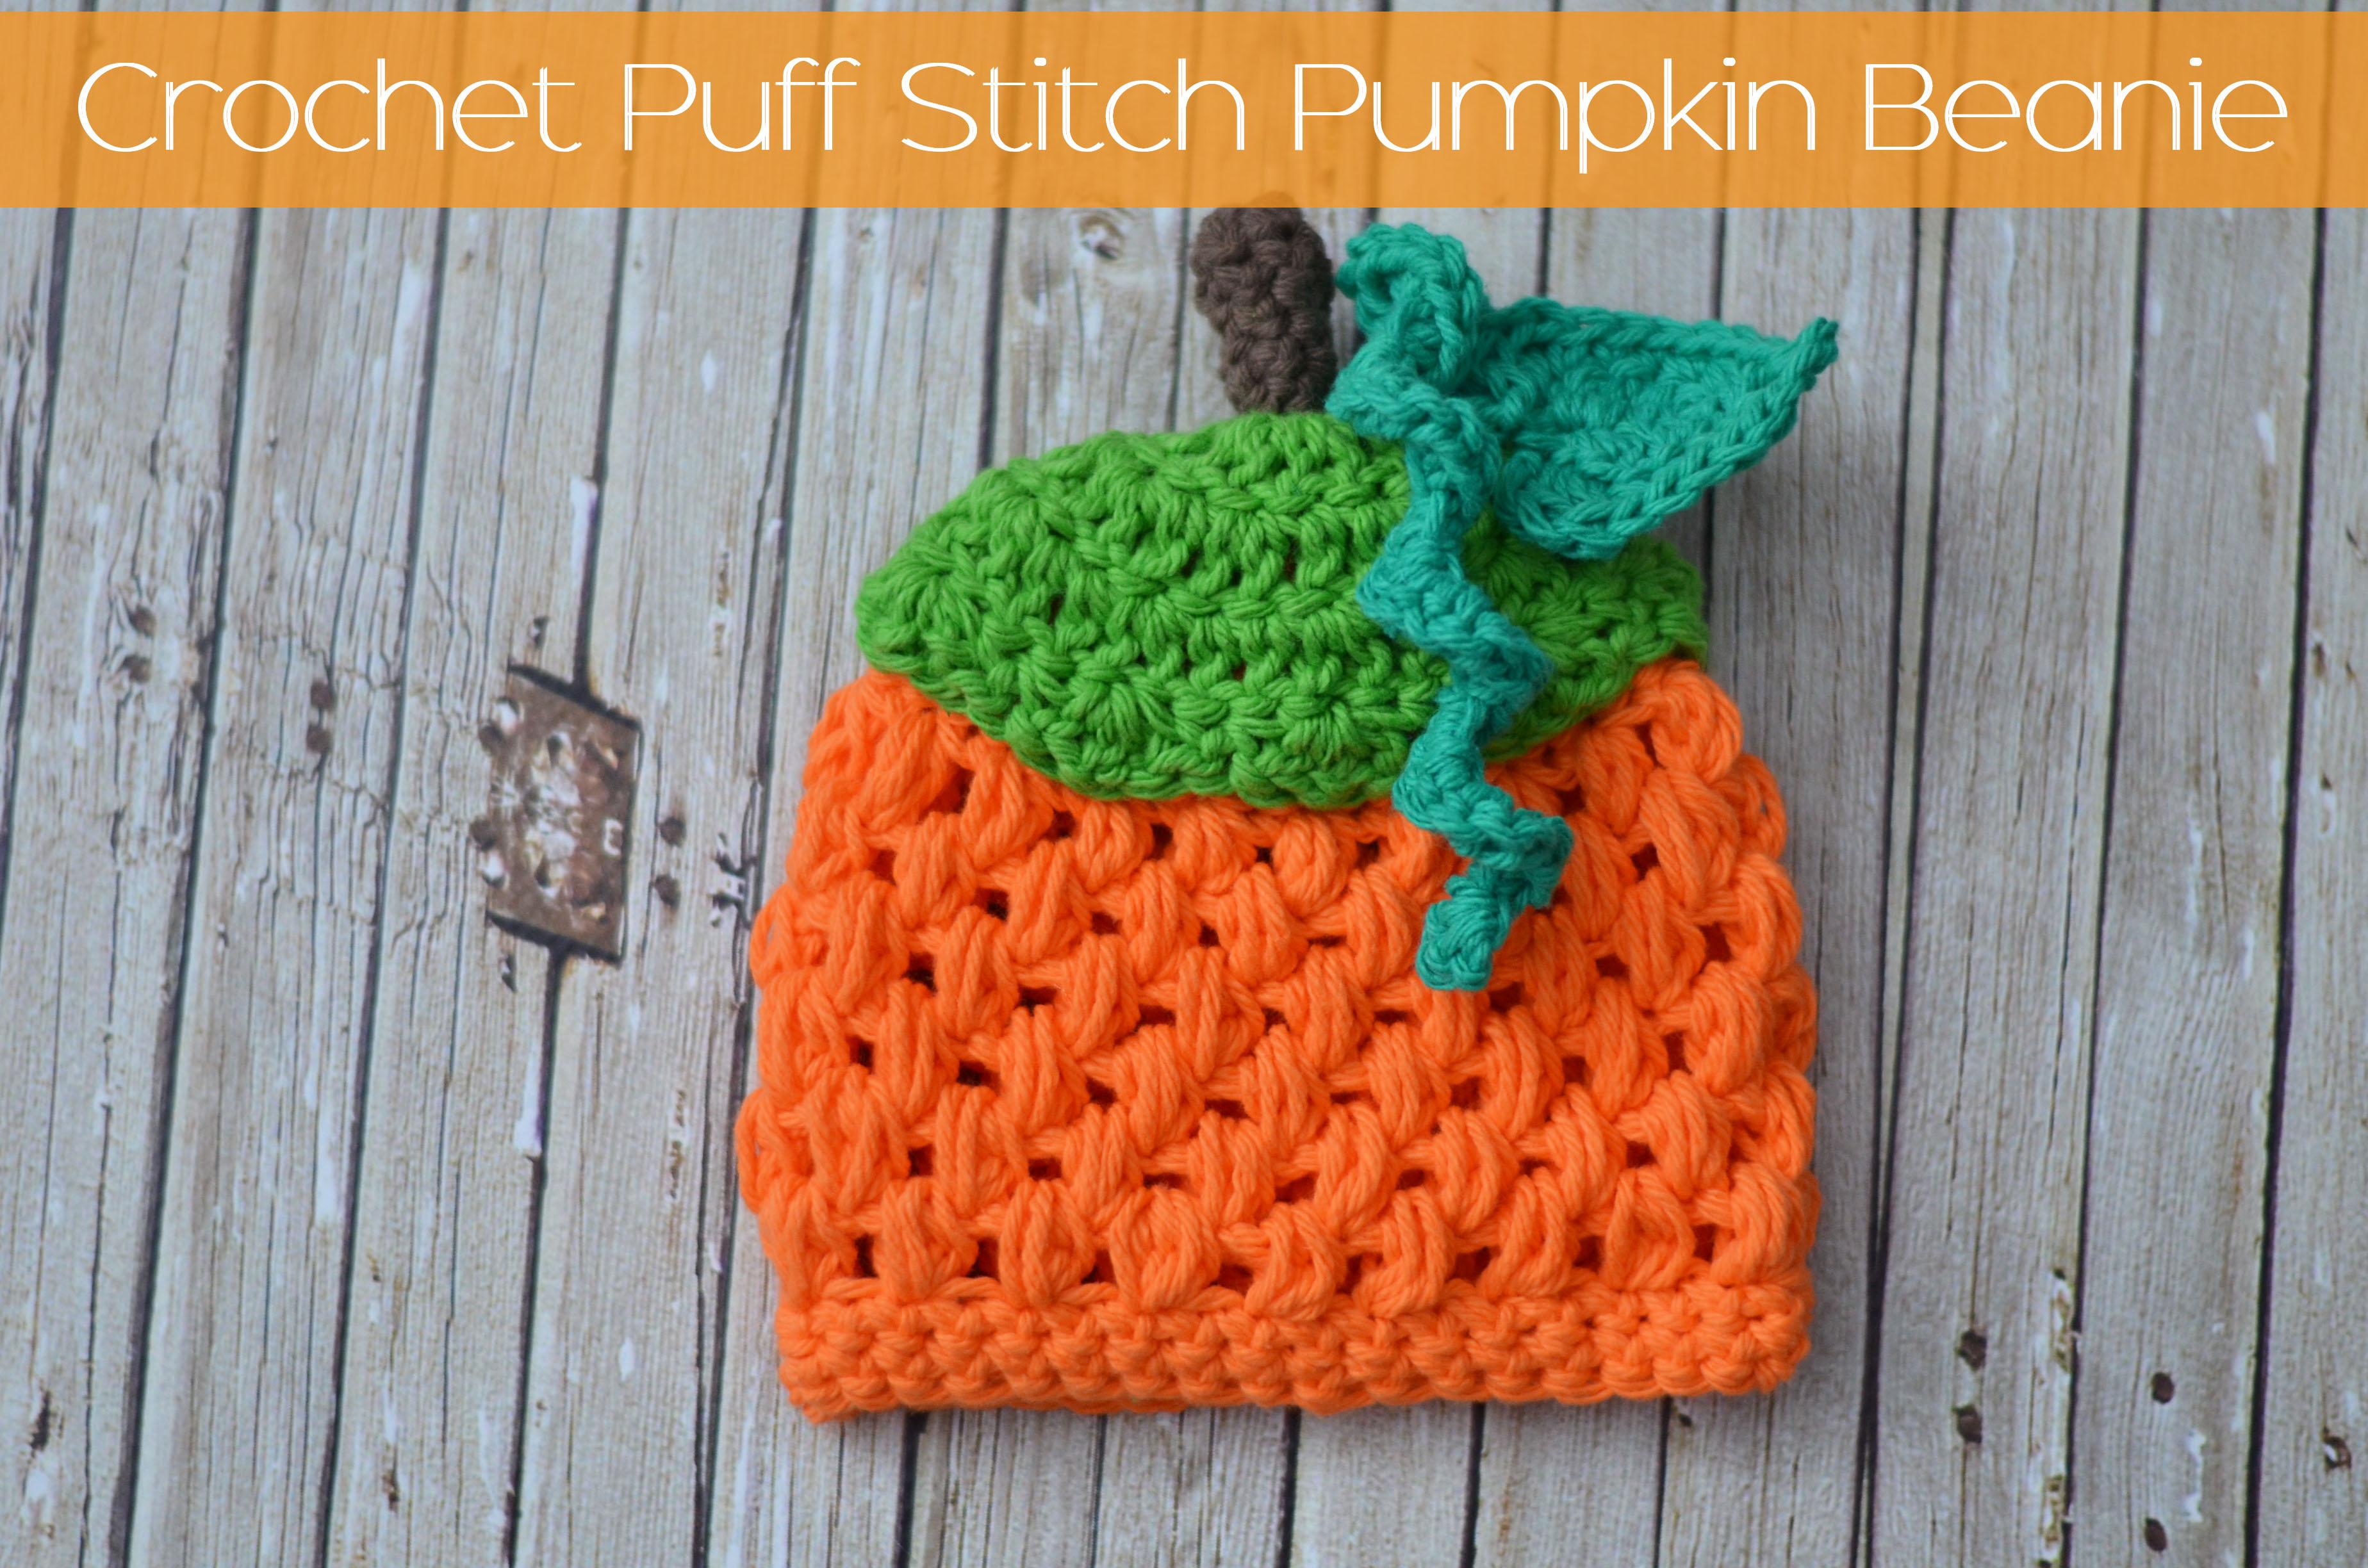 Crochet Puff Stitch Pumpkin Beanie – Free Pattern